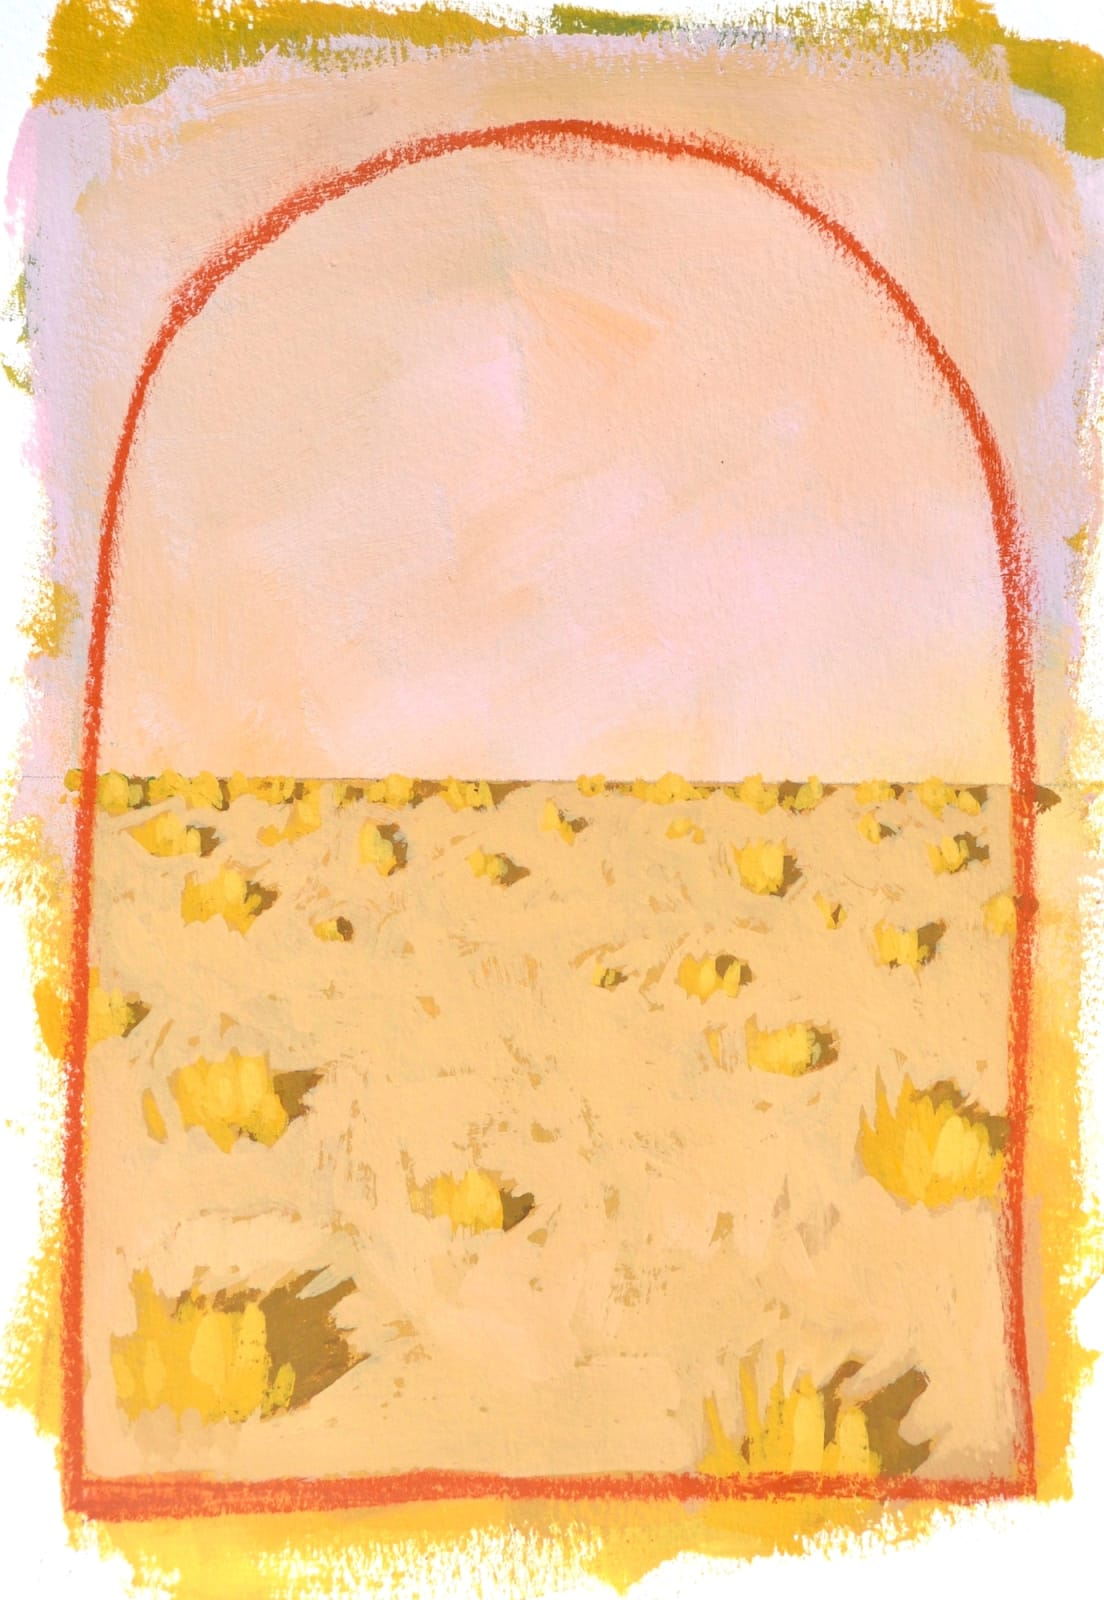 Layla Luna, Mini Desert Painting #05 (Fall), 2018